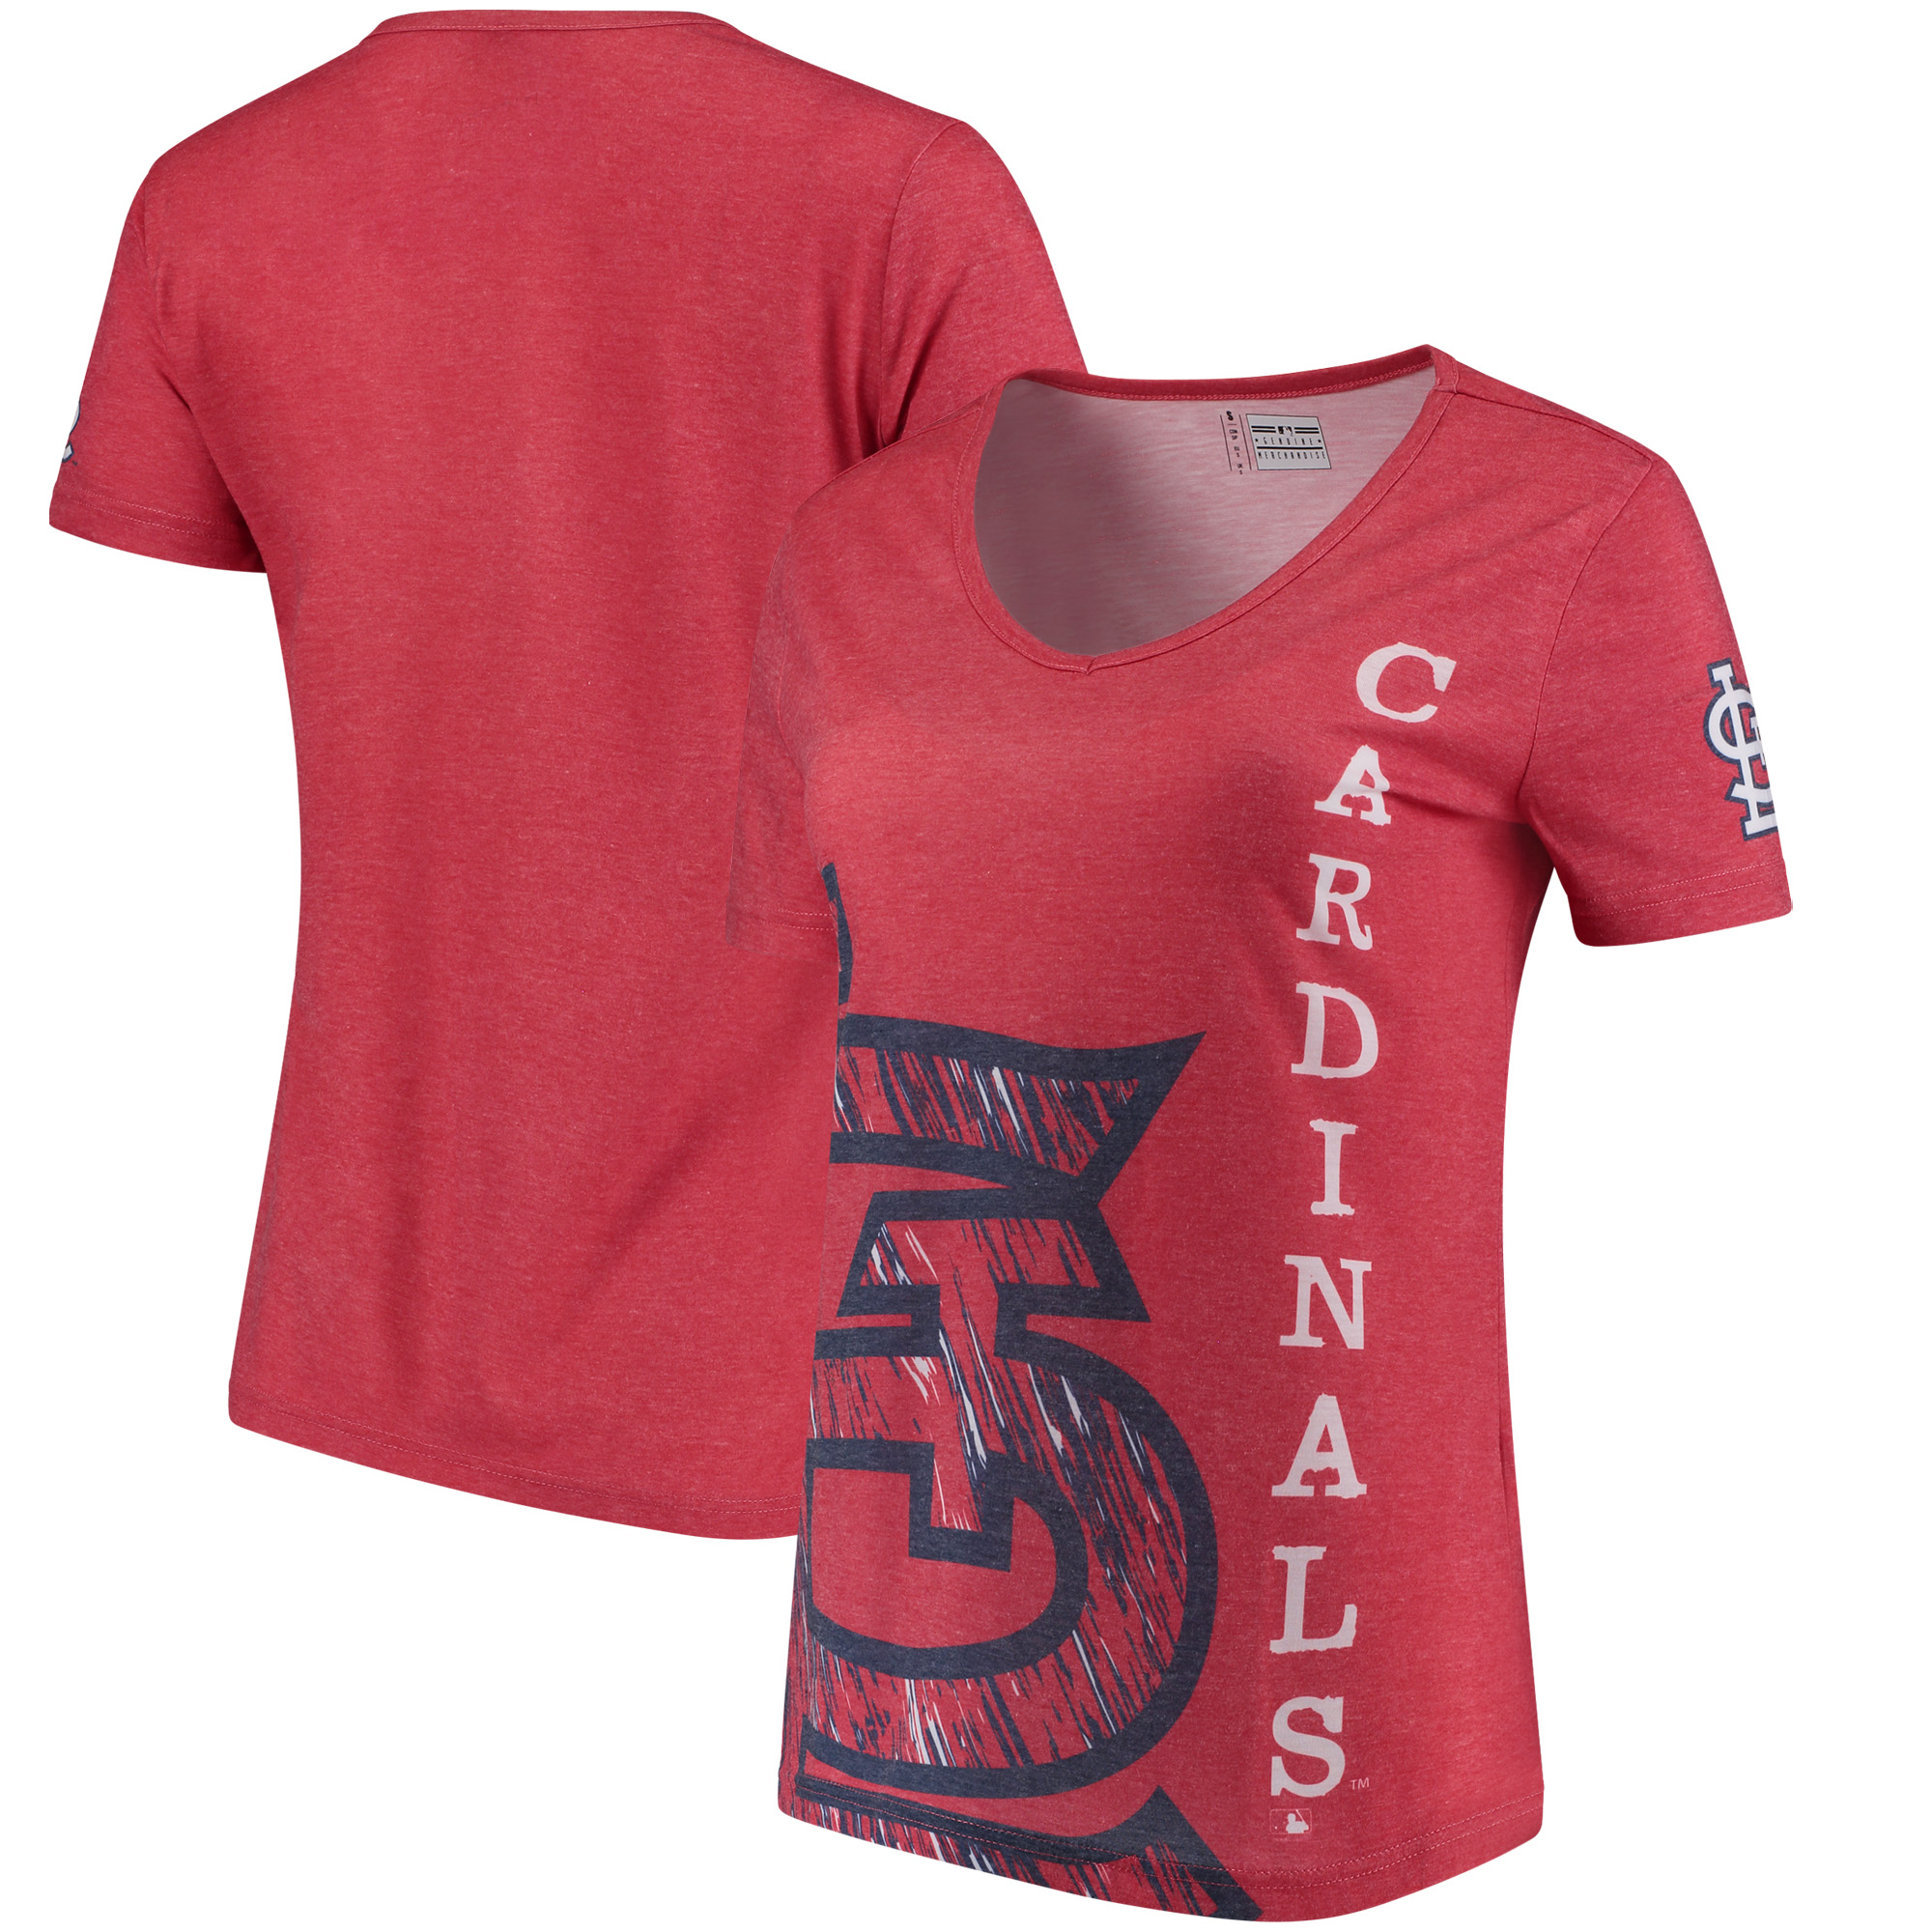 St. Louis Cardinals Women's Static Rain V-Neck T-Shirt - Red